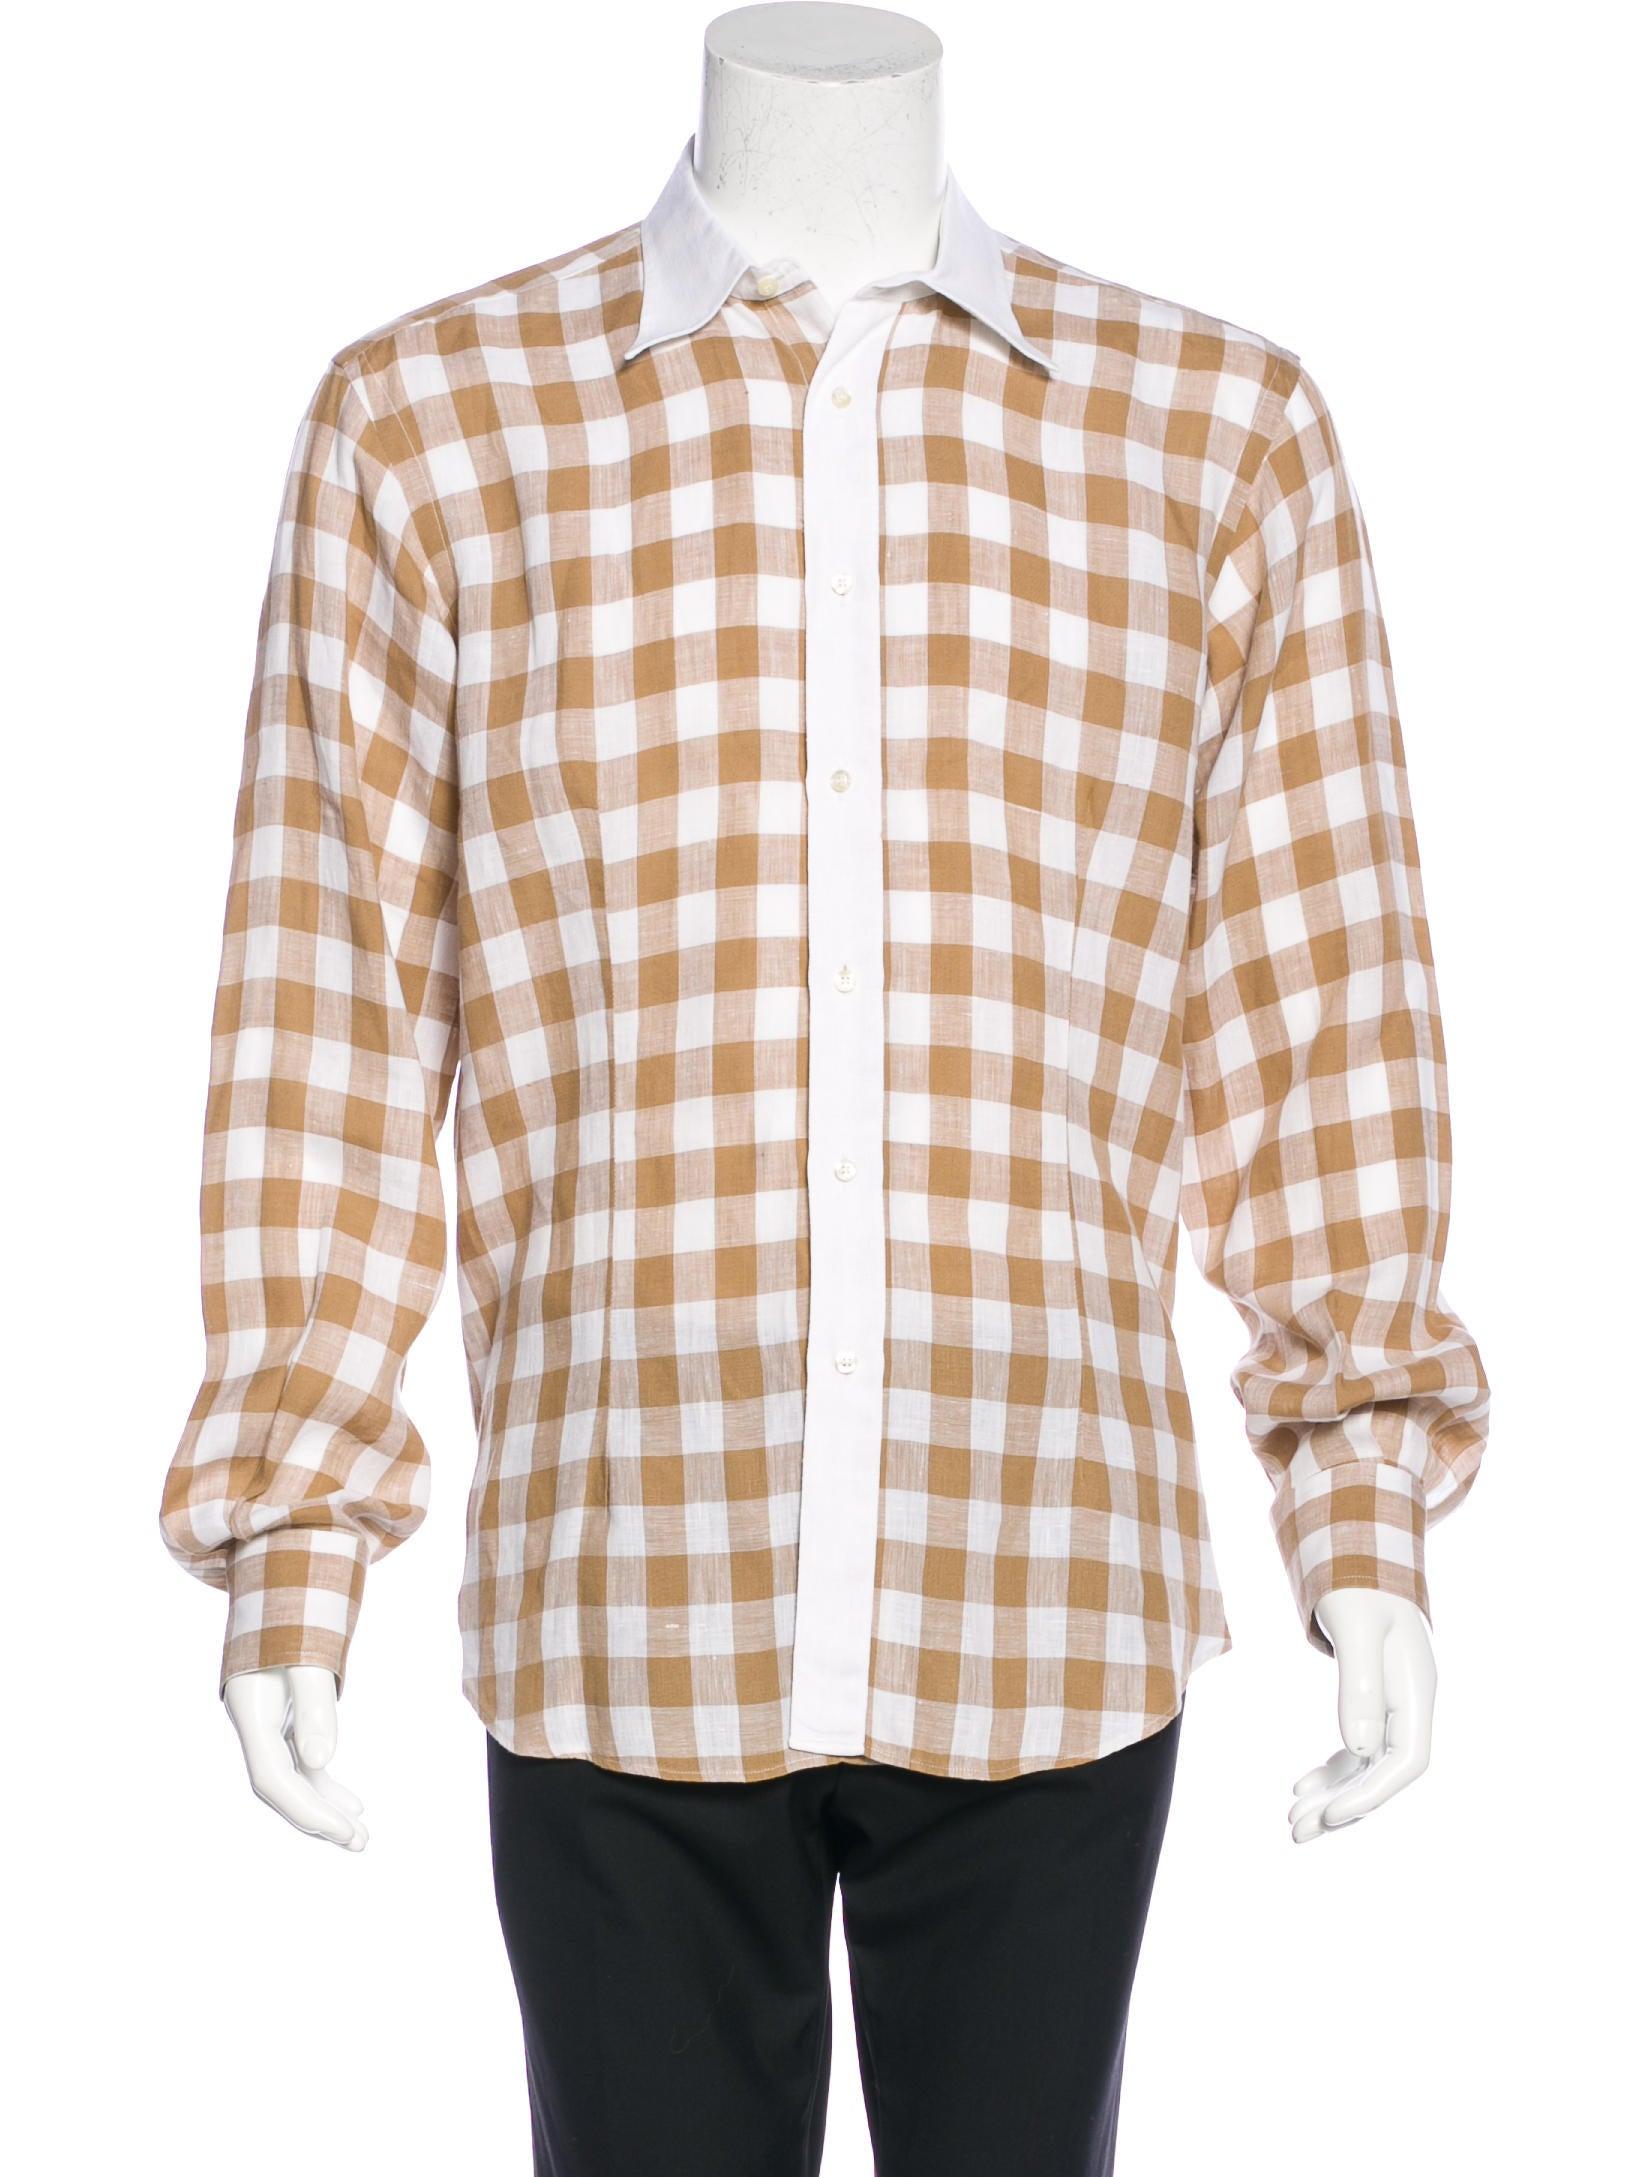 Etro linen gingham shirt mens shirts etr43842 the for Etro men s shirts